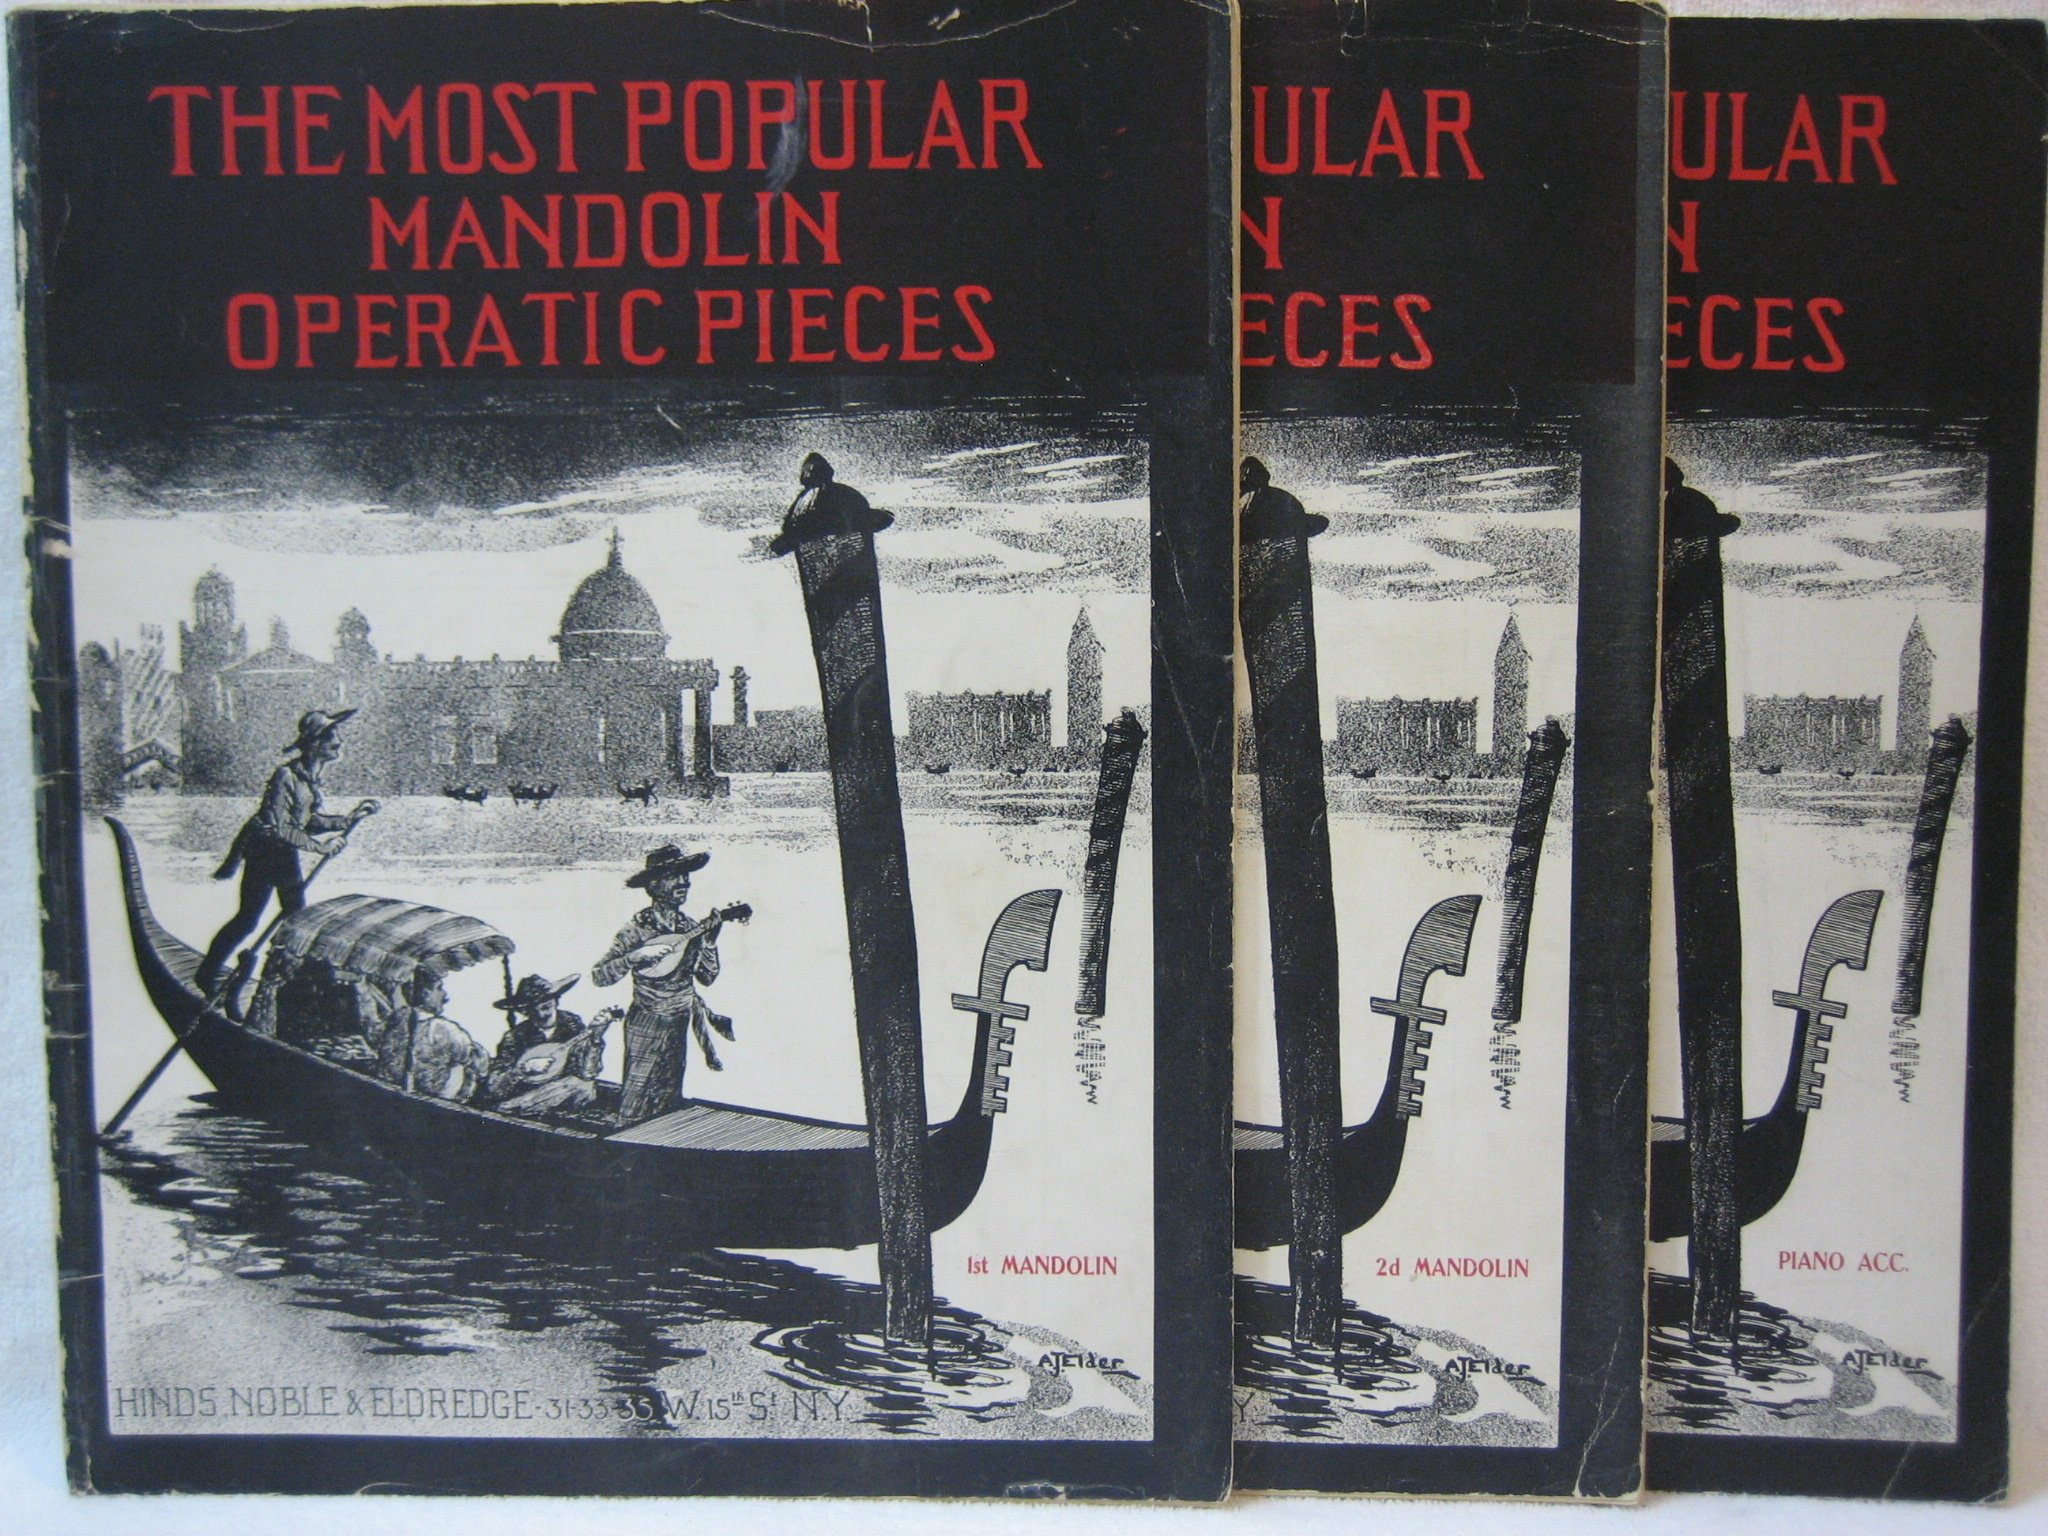 The Most Popular Mandolin Operatic Pieces - 1st & 2nd Mandolin and Piano Accompaniment